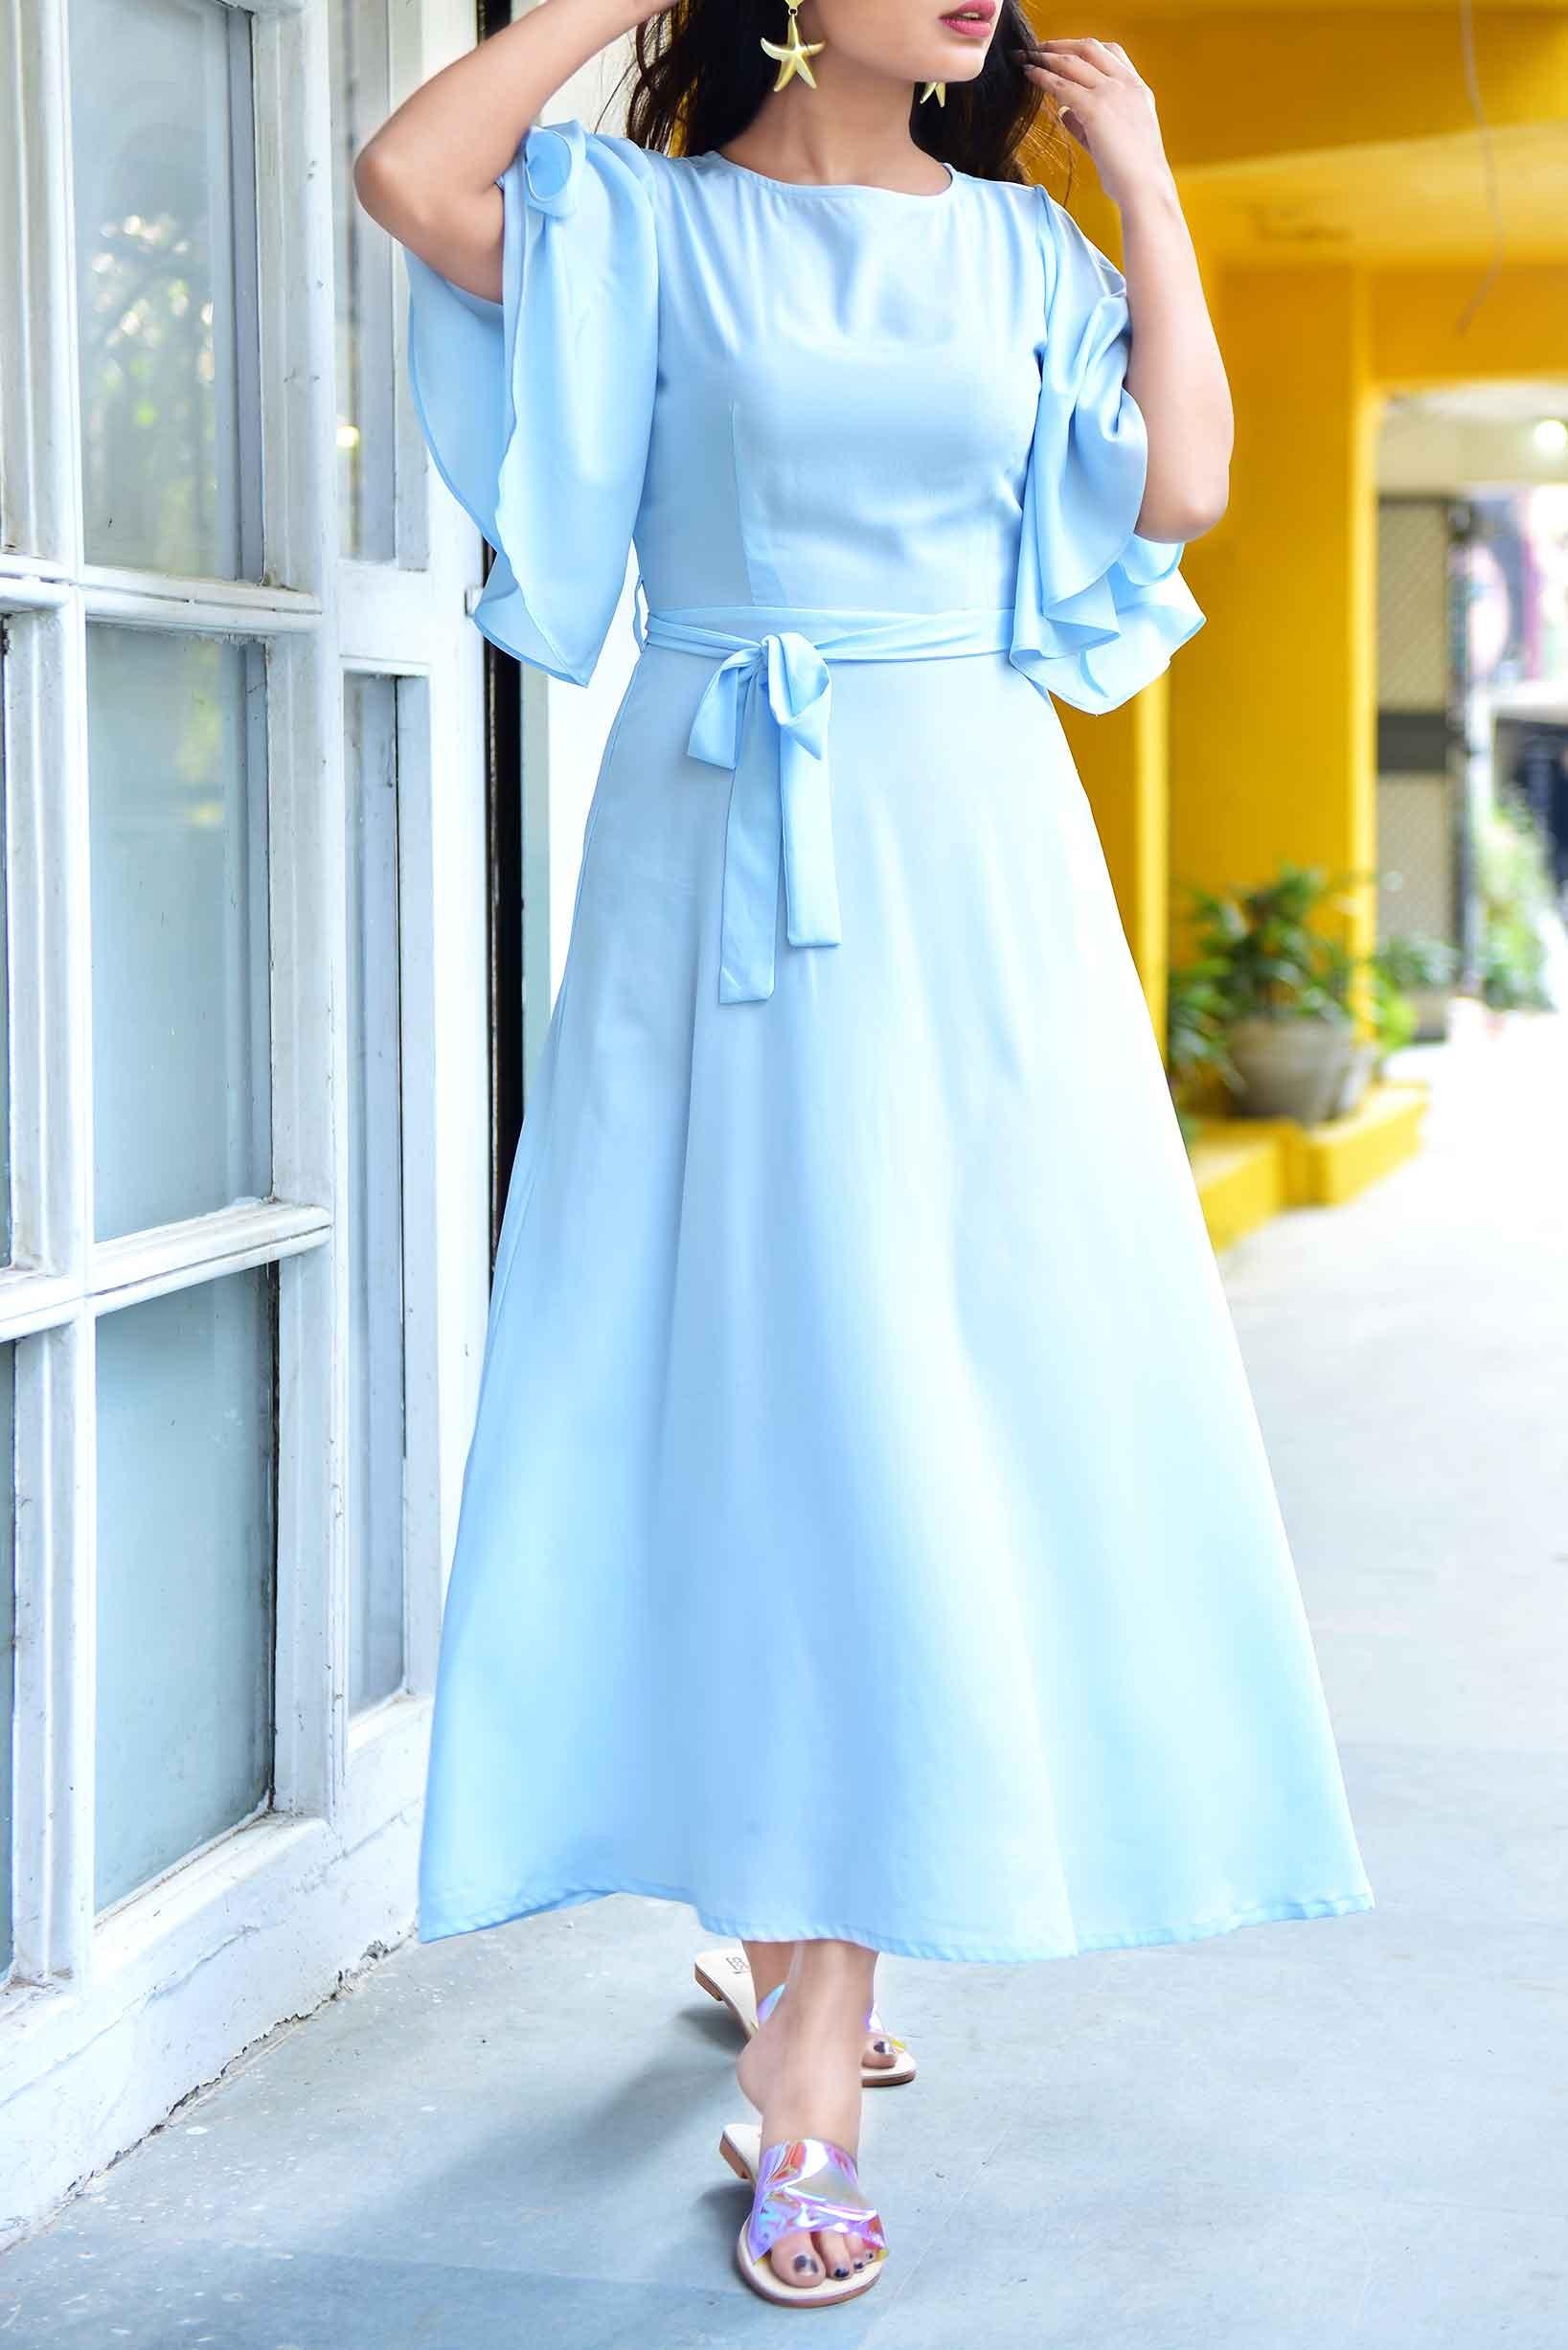 Stunning Wonder Dress